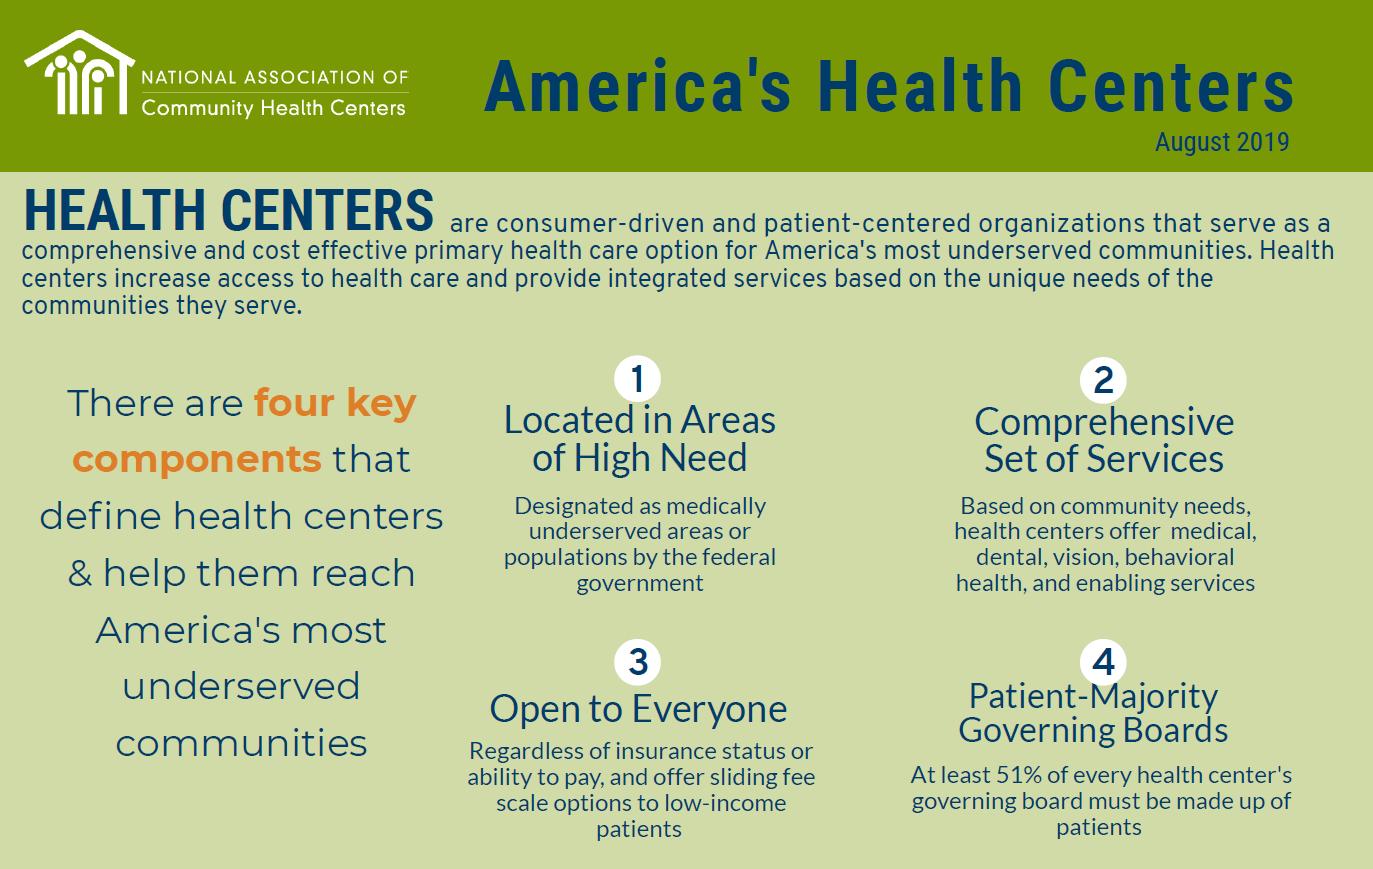 America's Health Centers